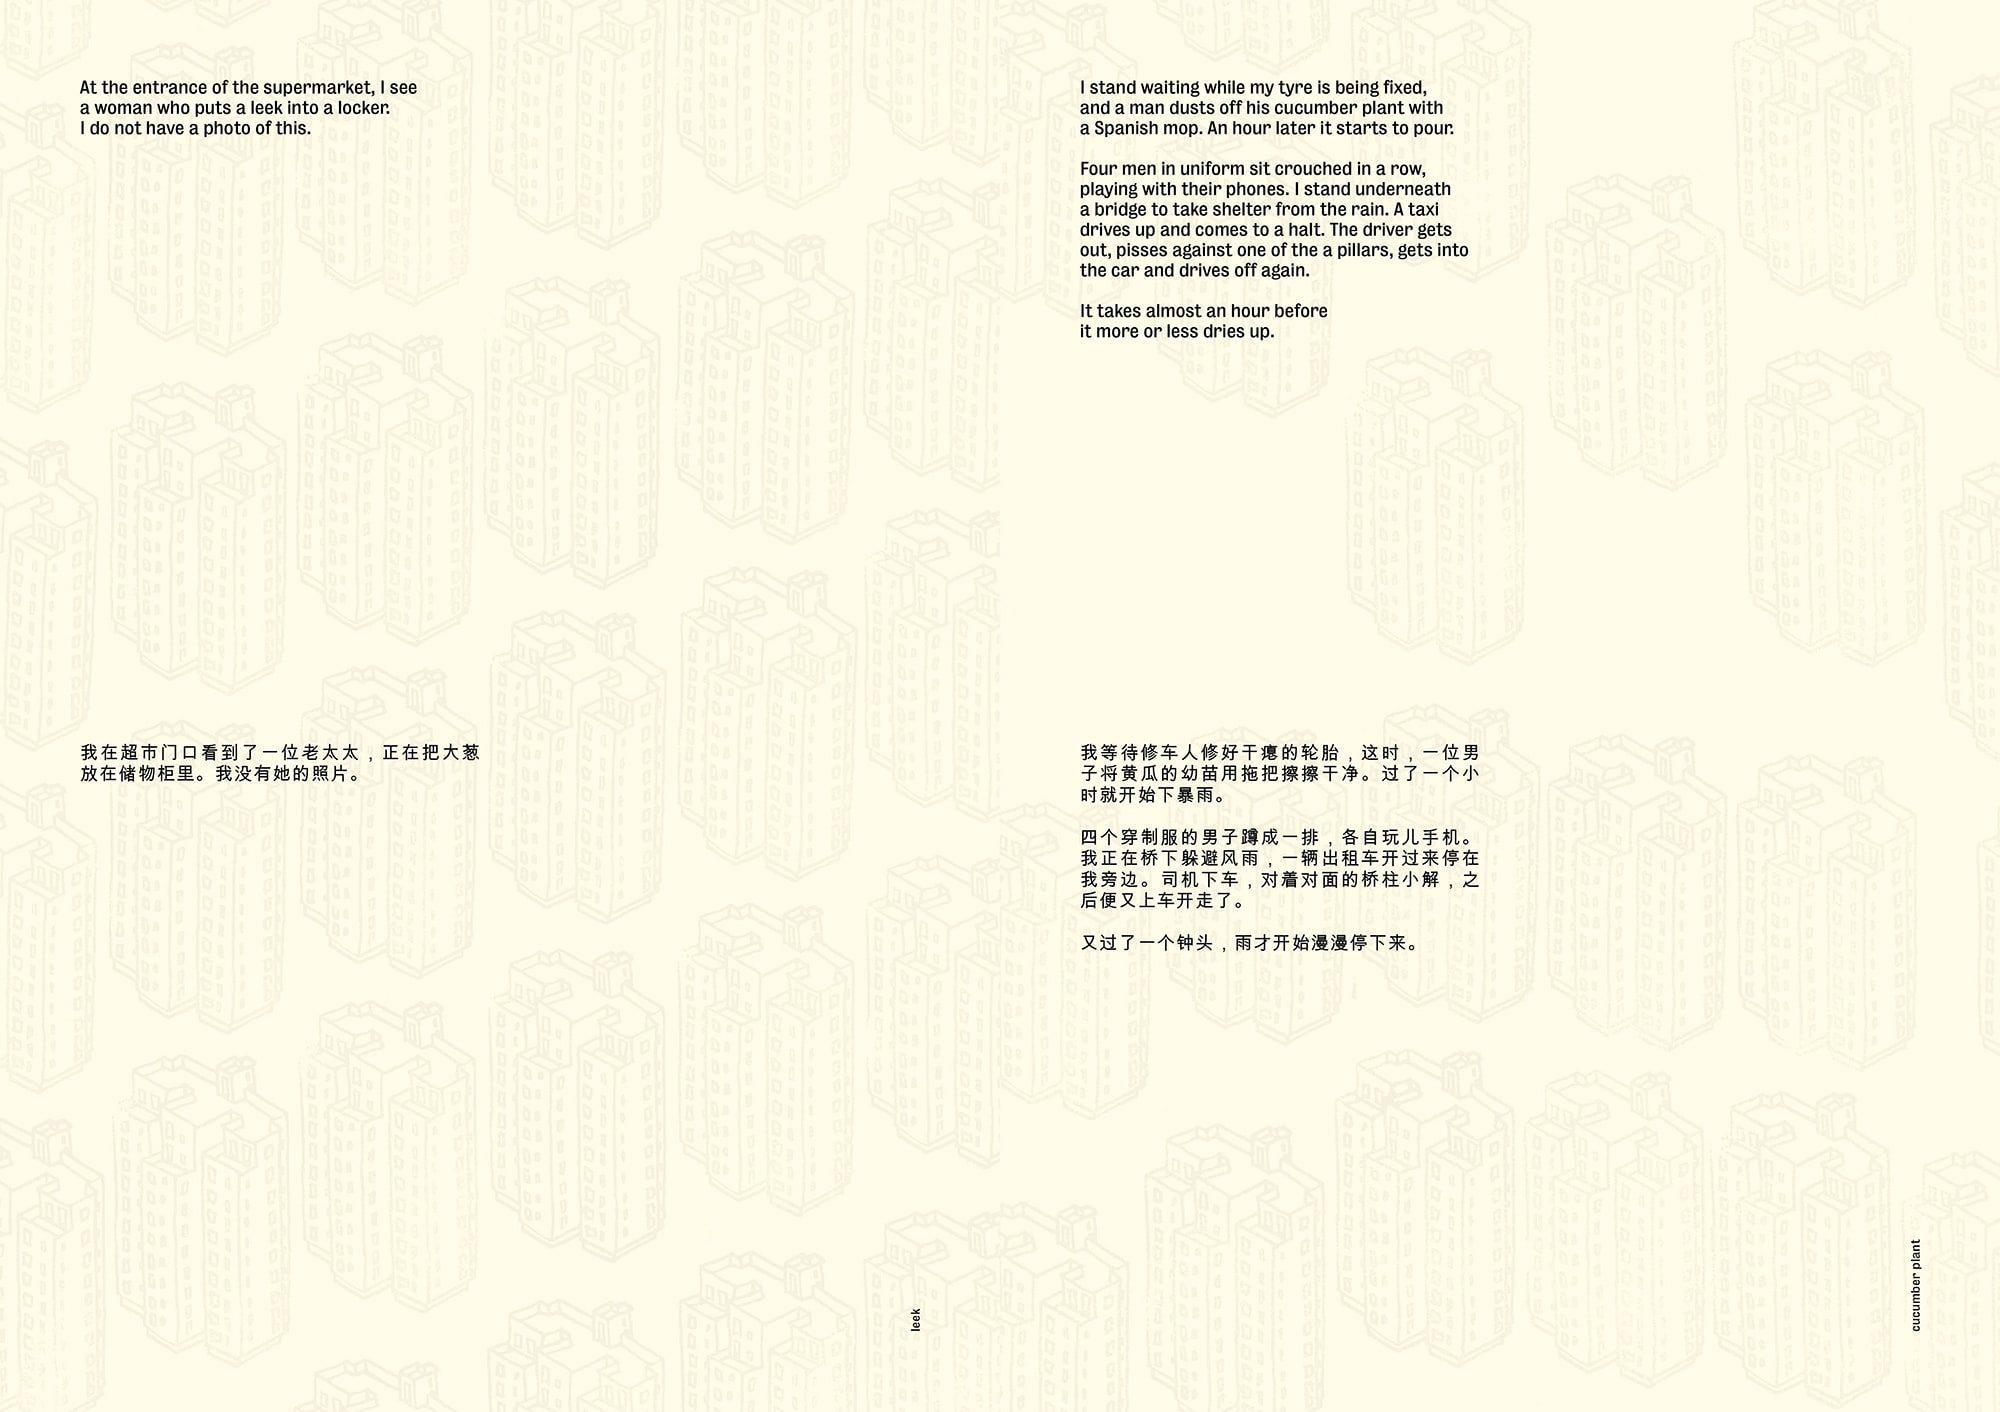 Maurice Bogaert / Publicatie / Strange Tales From My Chinese Studio / Black Sesame / Beijing / 2014